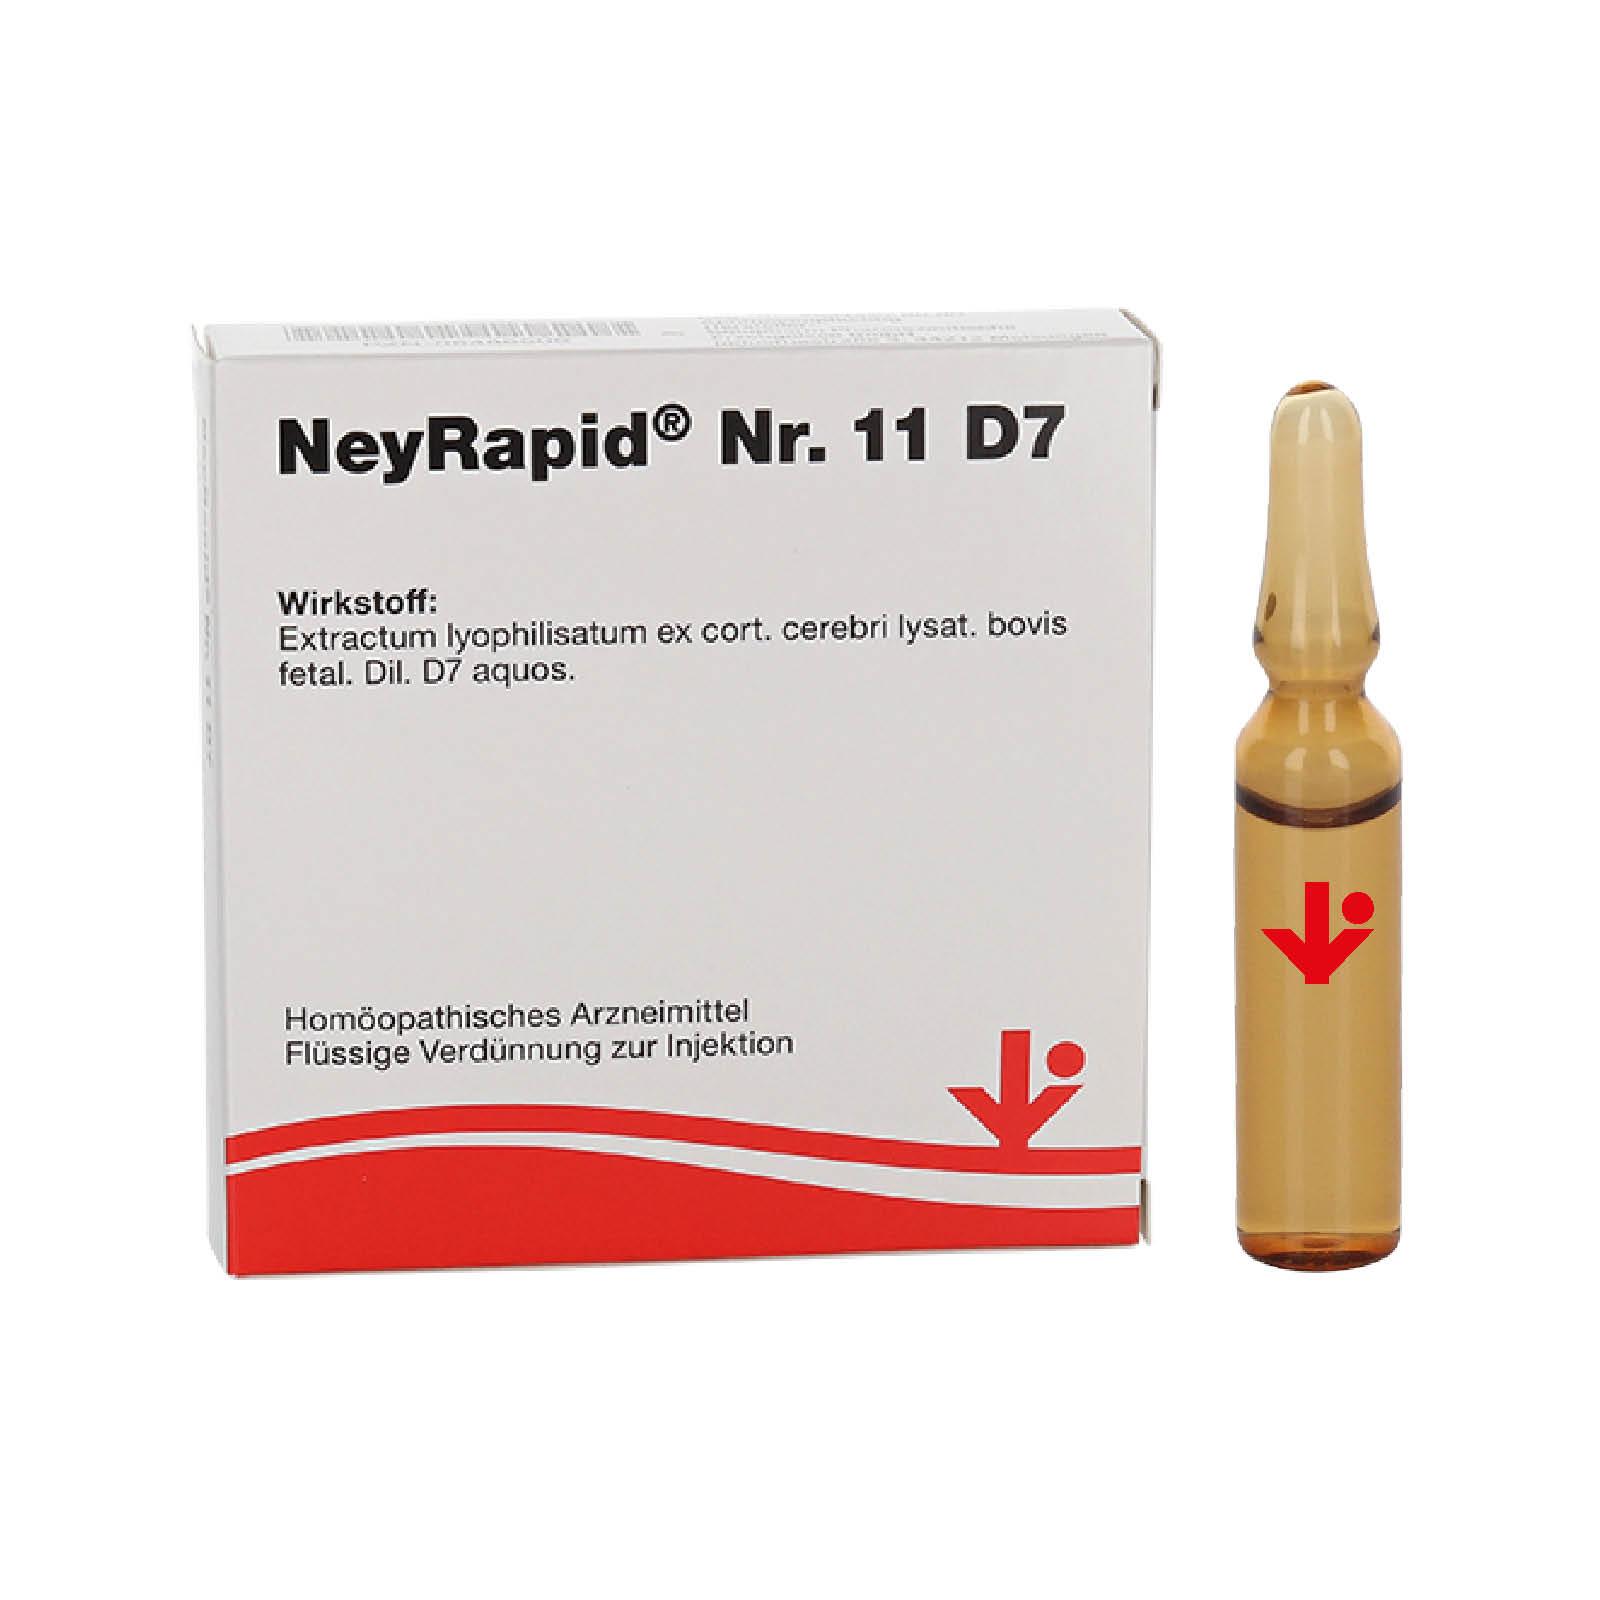 NeyRapid® Nr. 11 D7